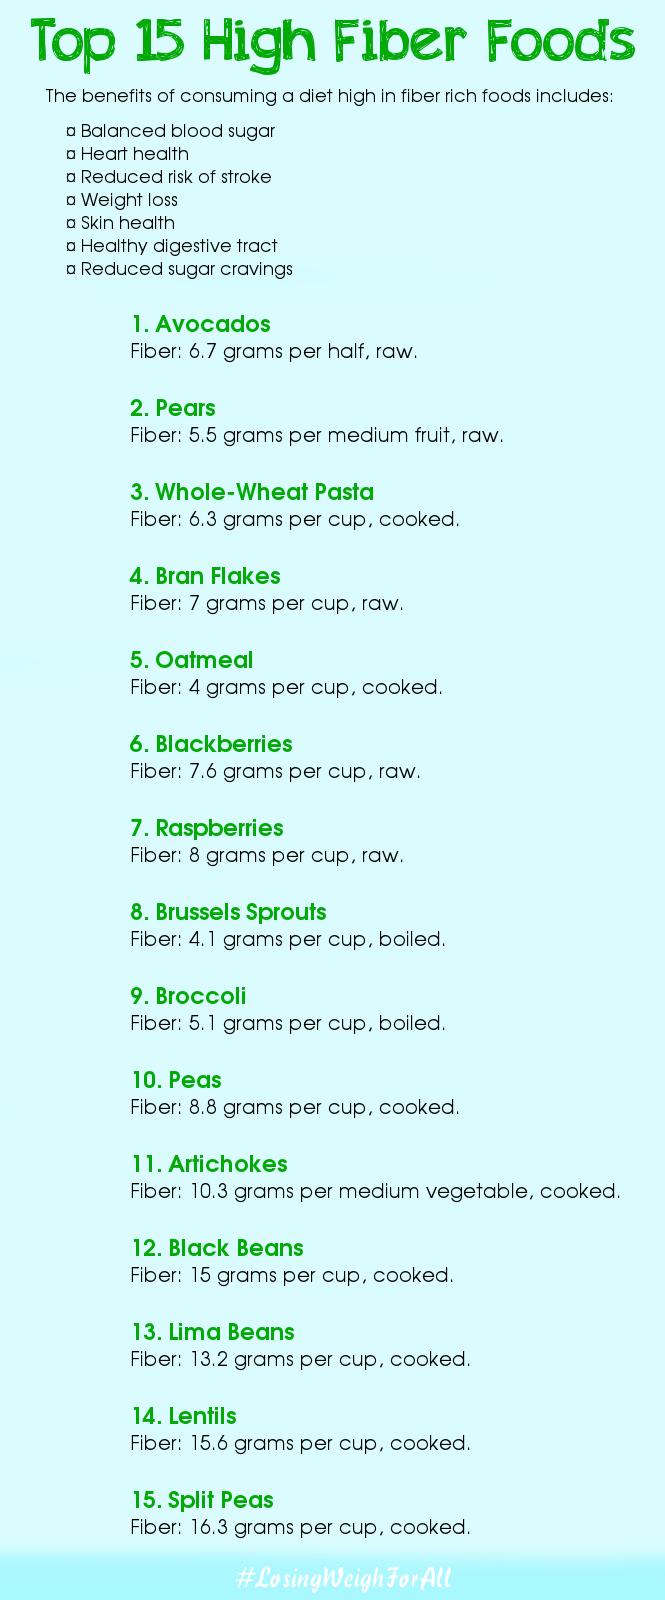 Top 15 High Fiber Foods